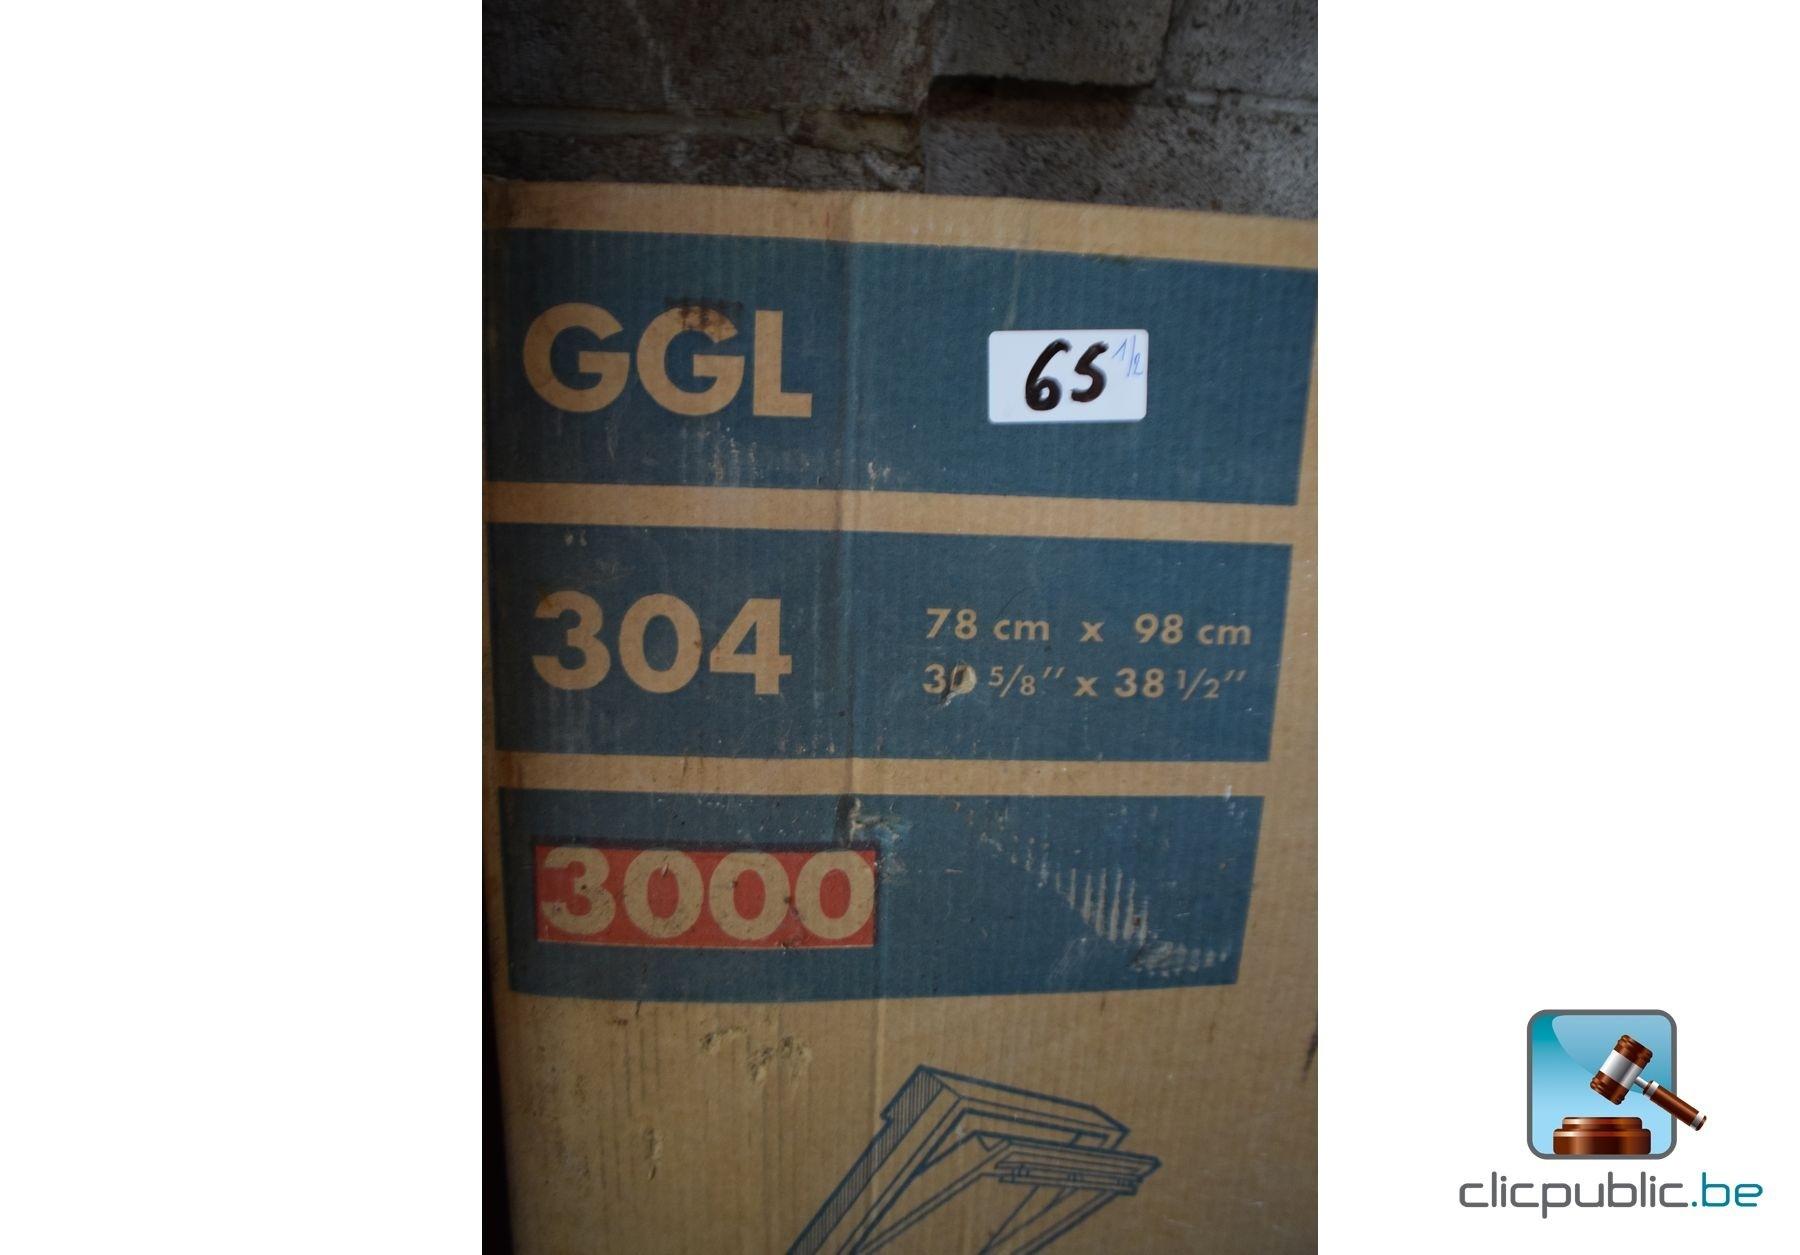 store velux ggl edh ref 65